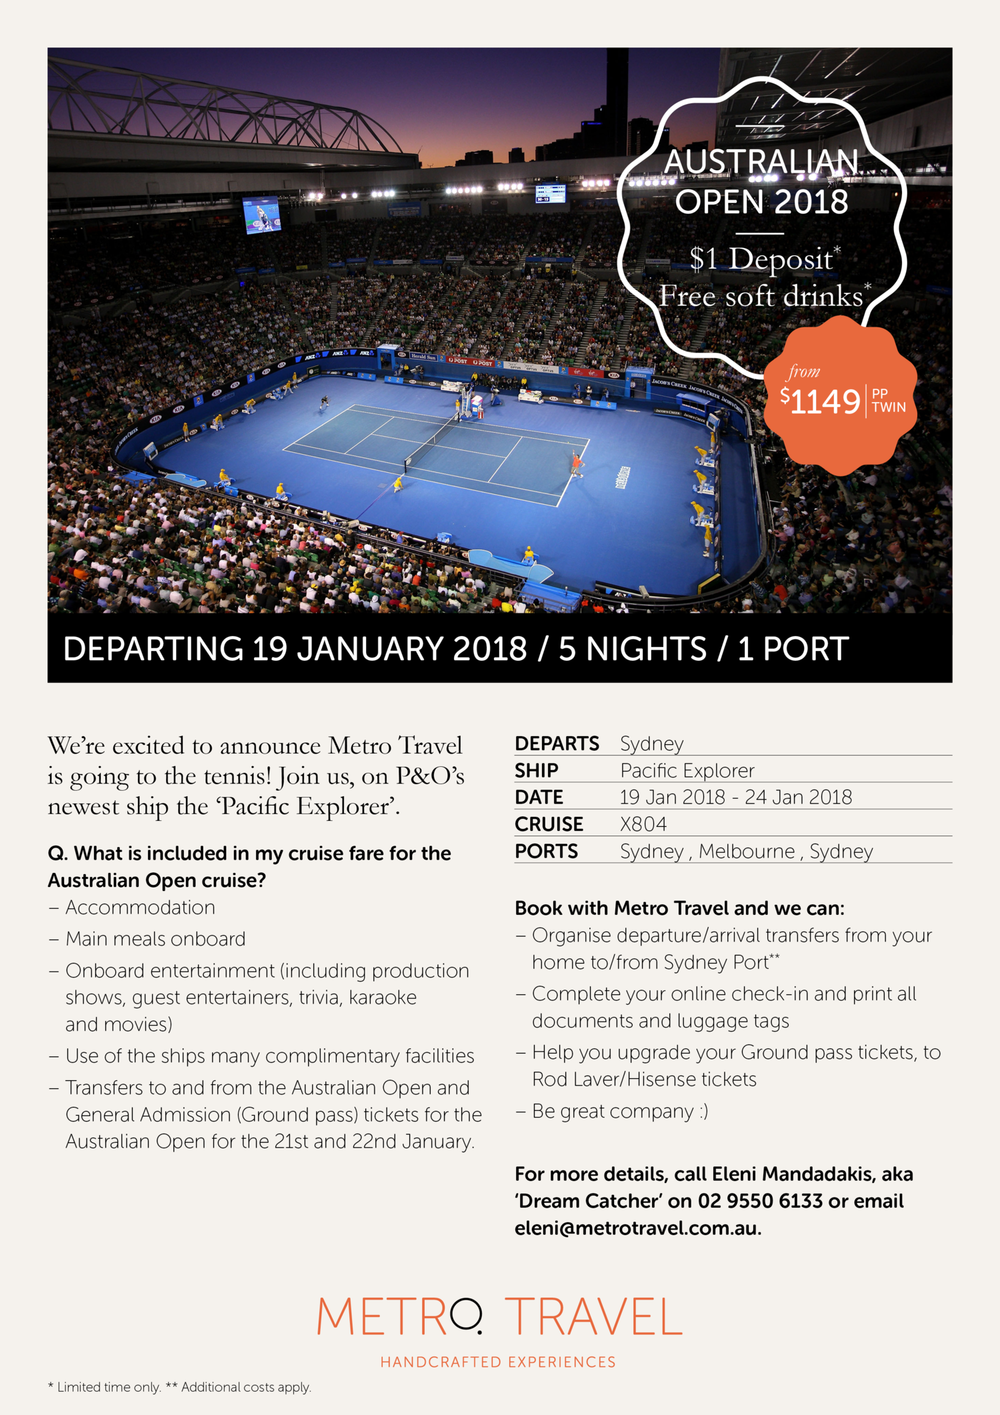 metro_australian_open_2018_cruise.png